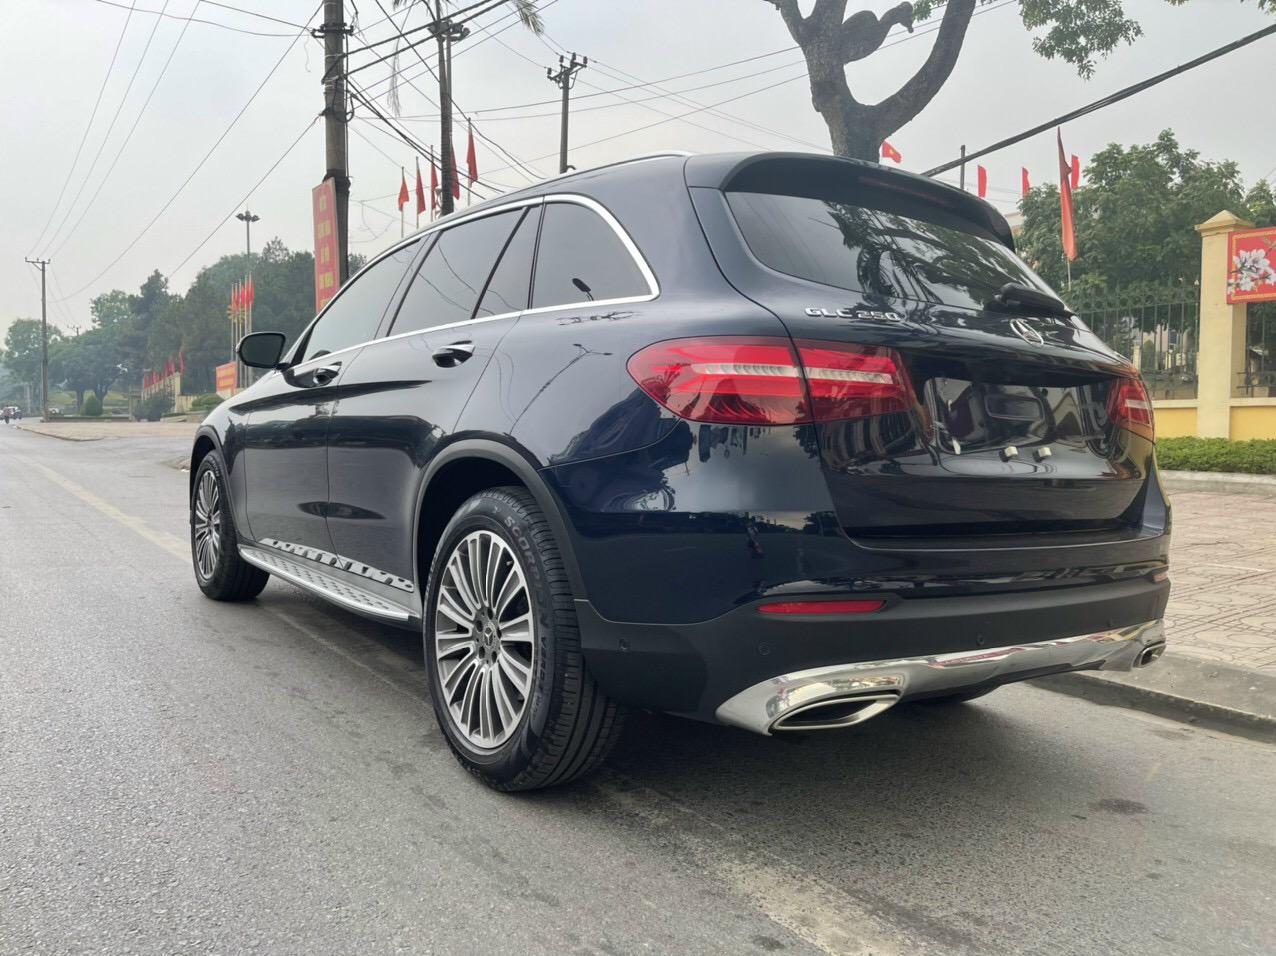 Bán xe Mercedes GLC250 sx 2019 lướt 20.000km